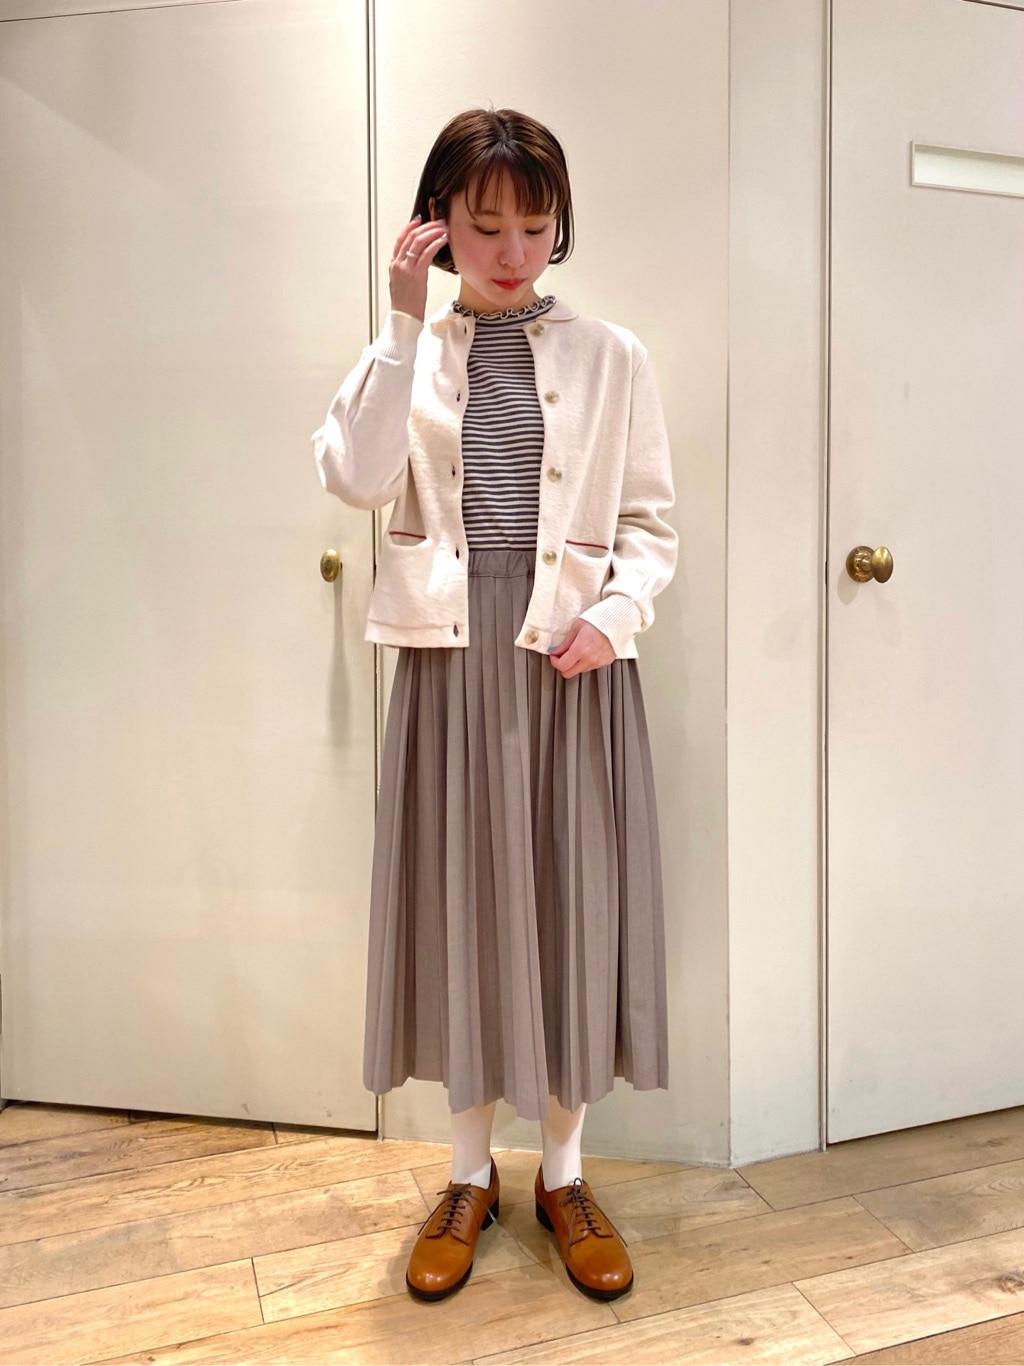 bulle de savon 新宿ミロード 身長:157cm 2021.01.28